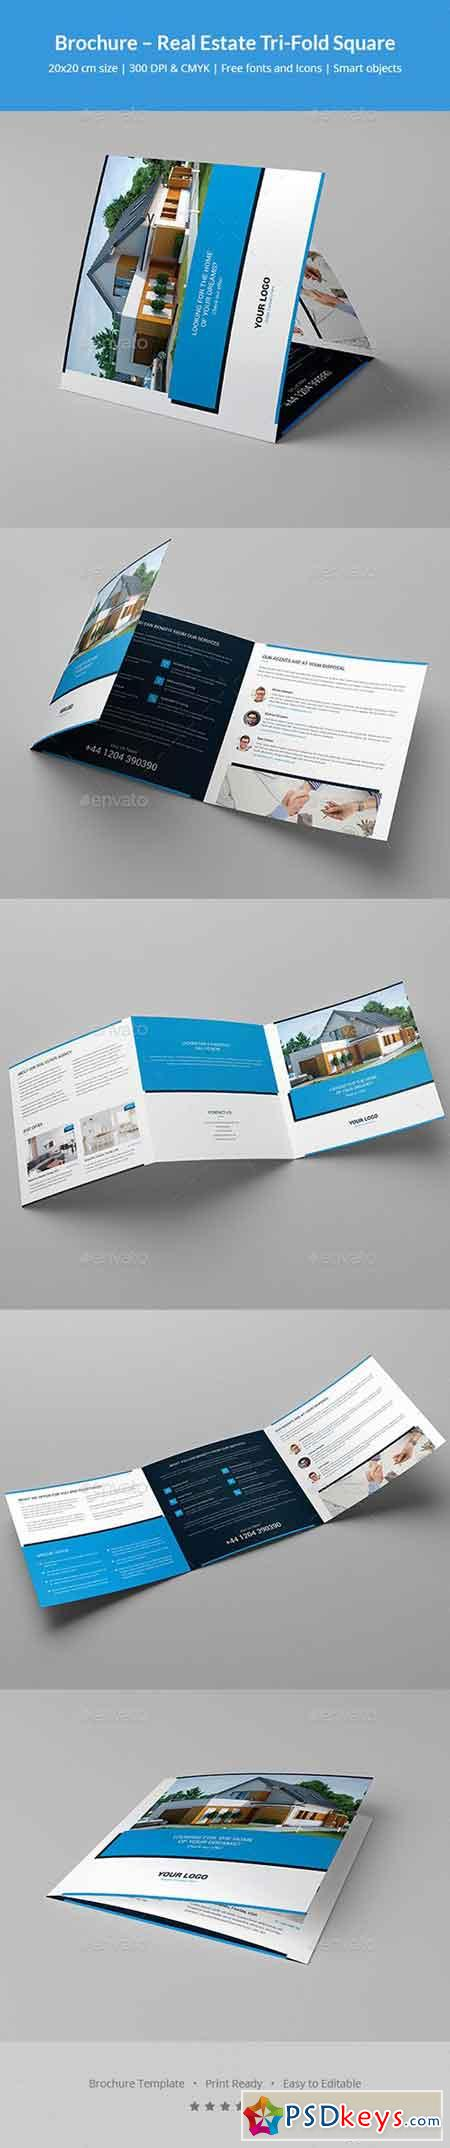 Brochure real estate tri fold square 20419366 free for Real estate tri fold brochure template